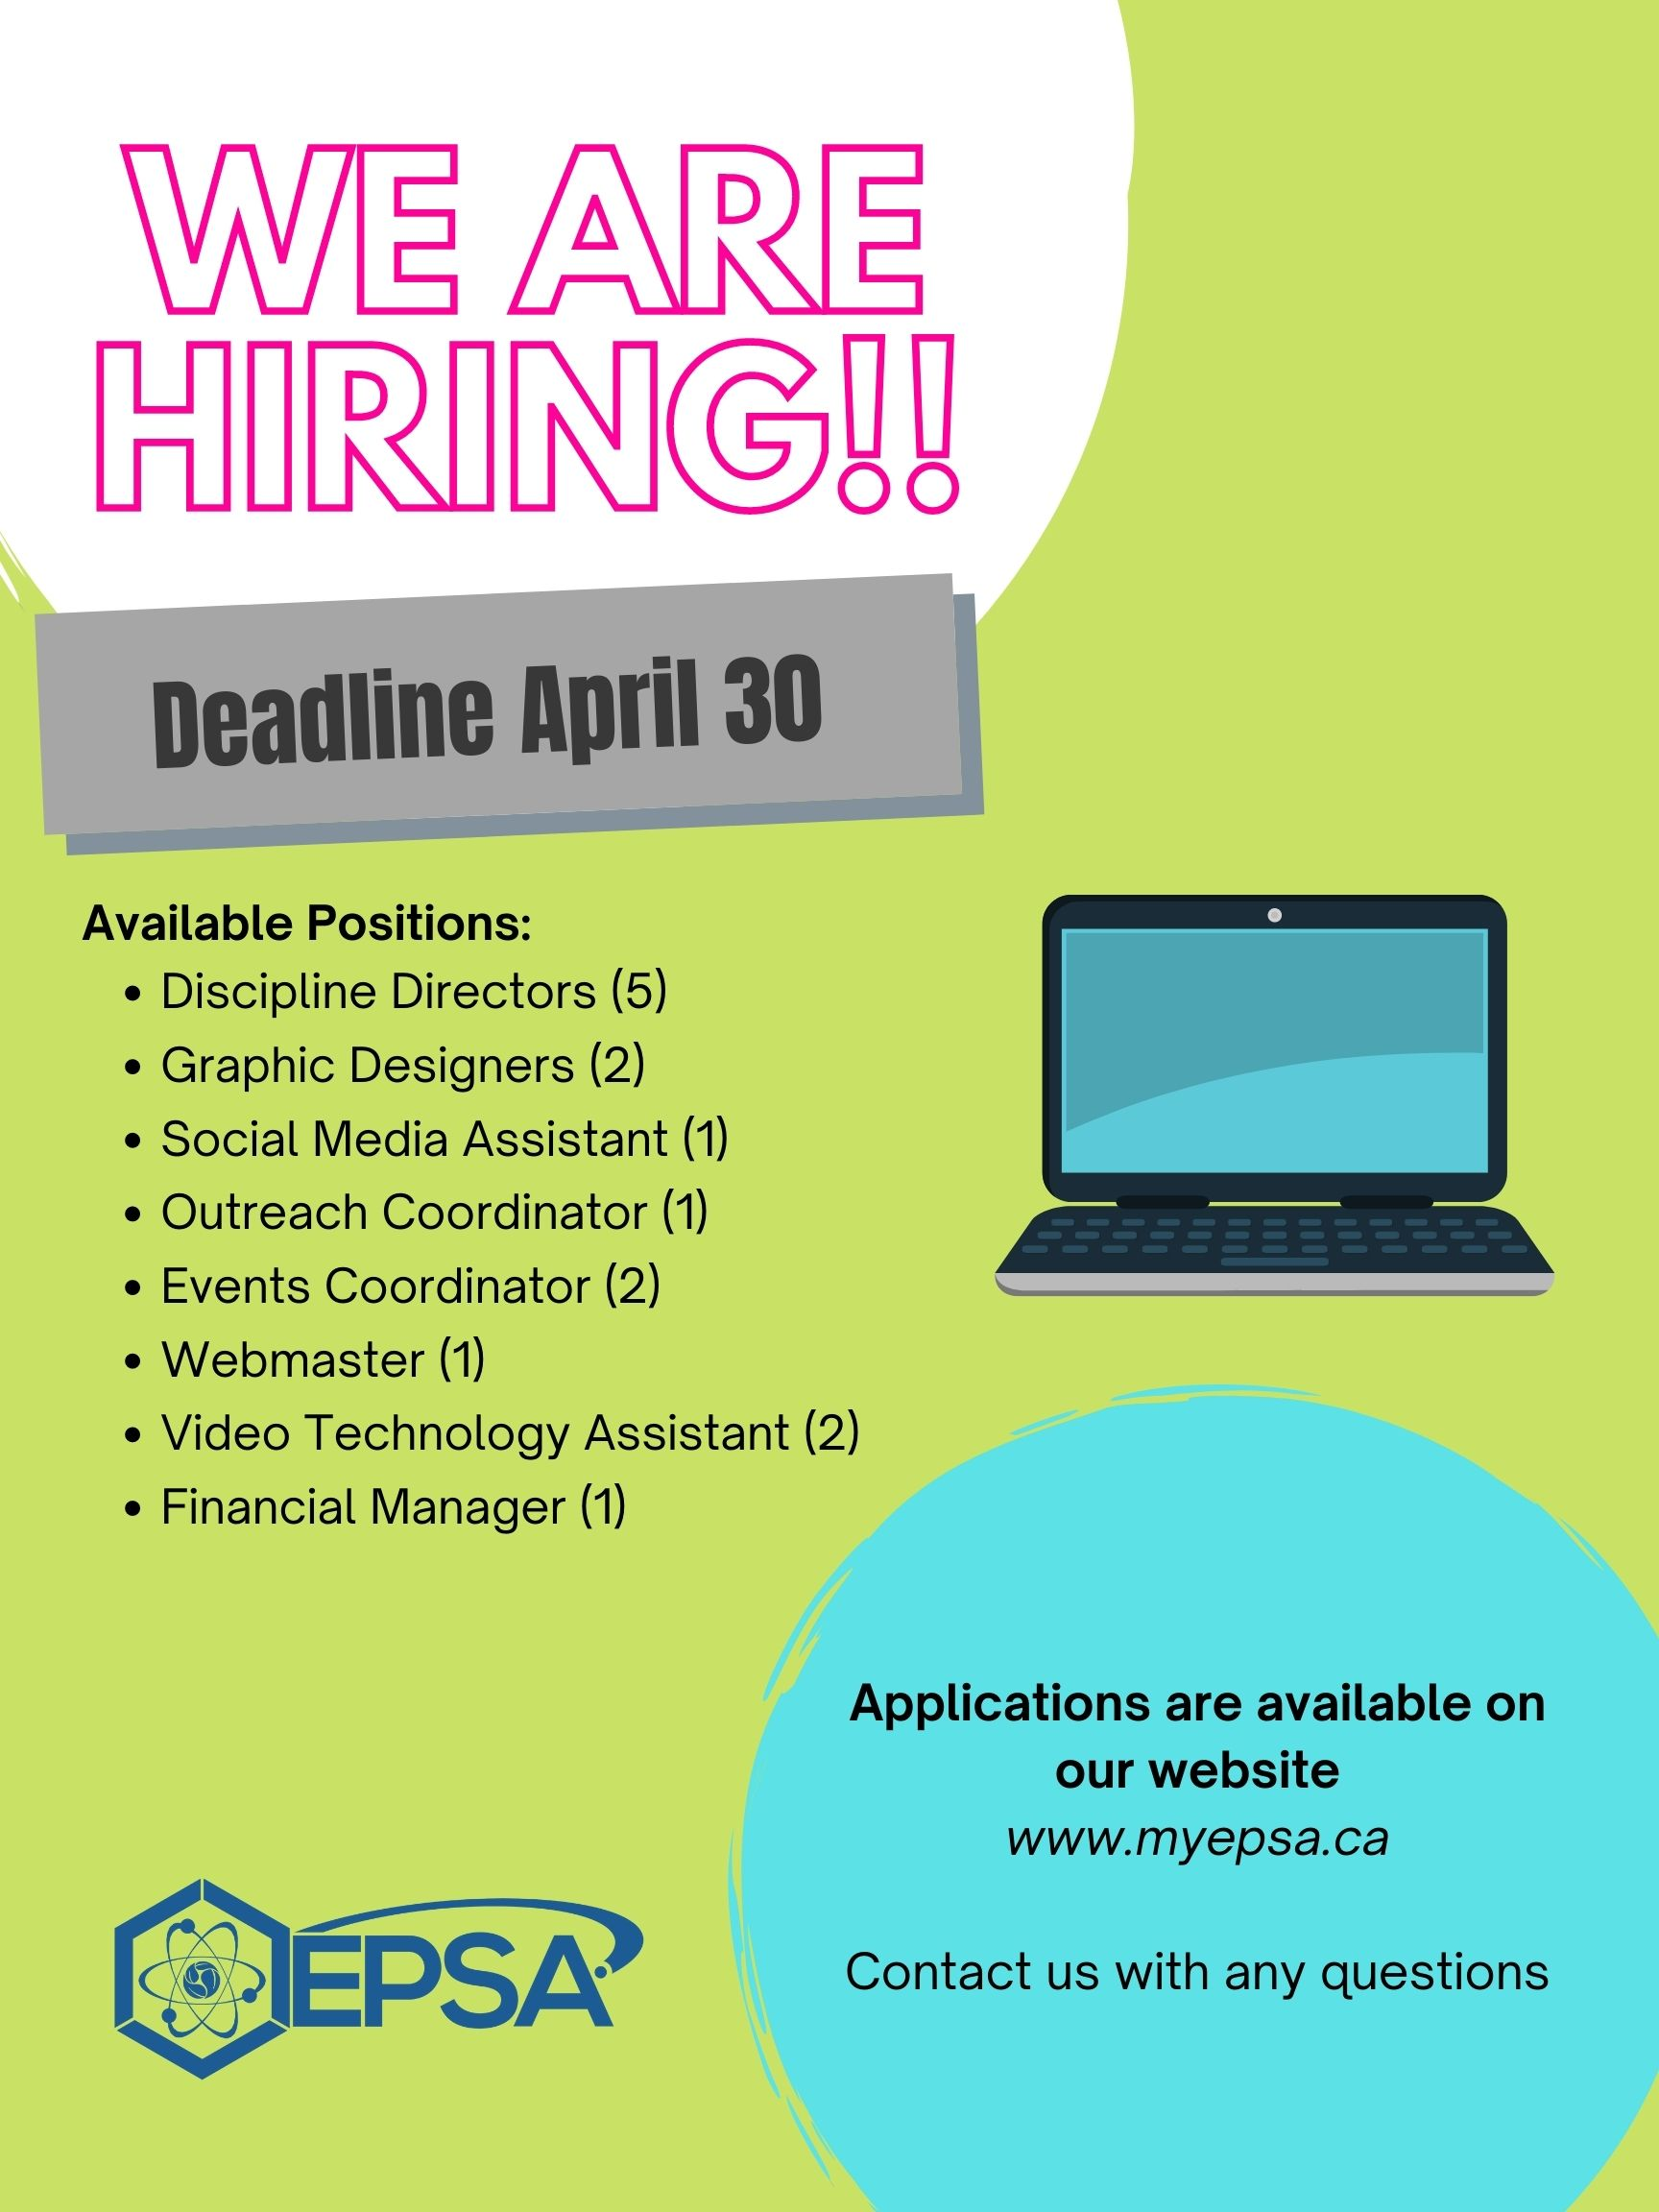 Epsa_hiring_April30